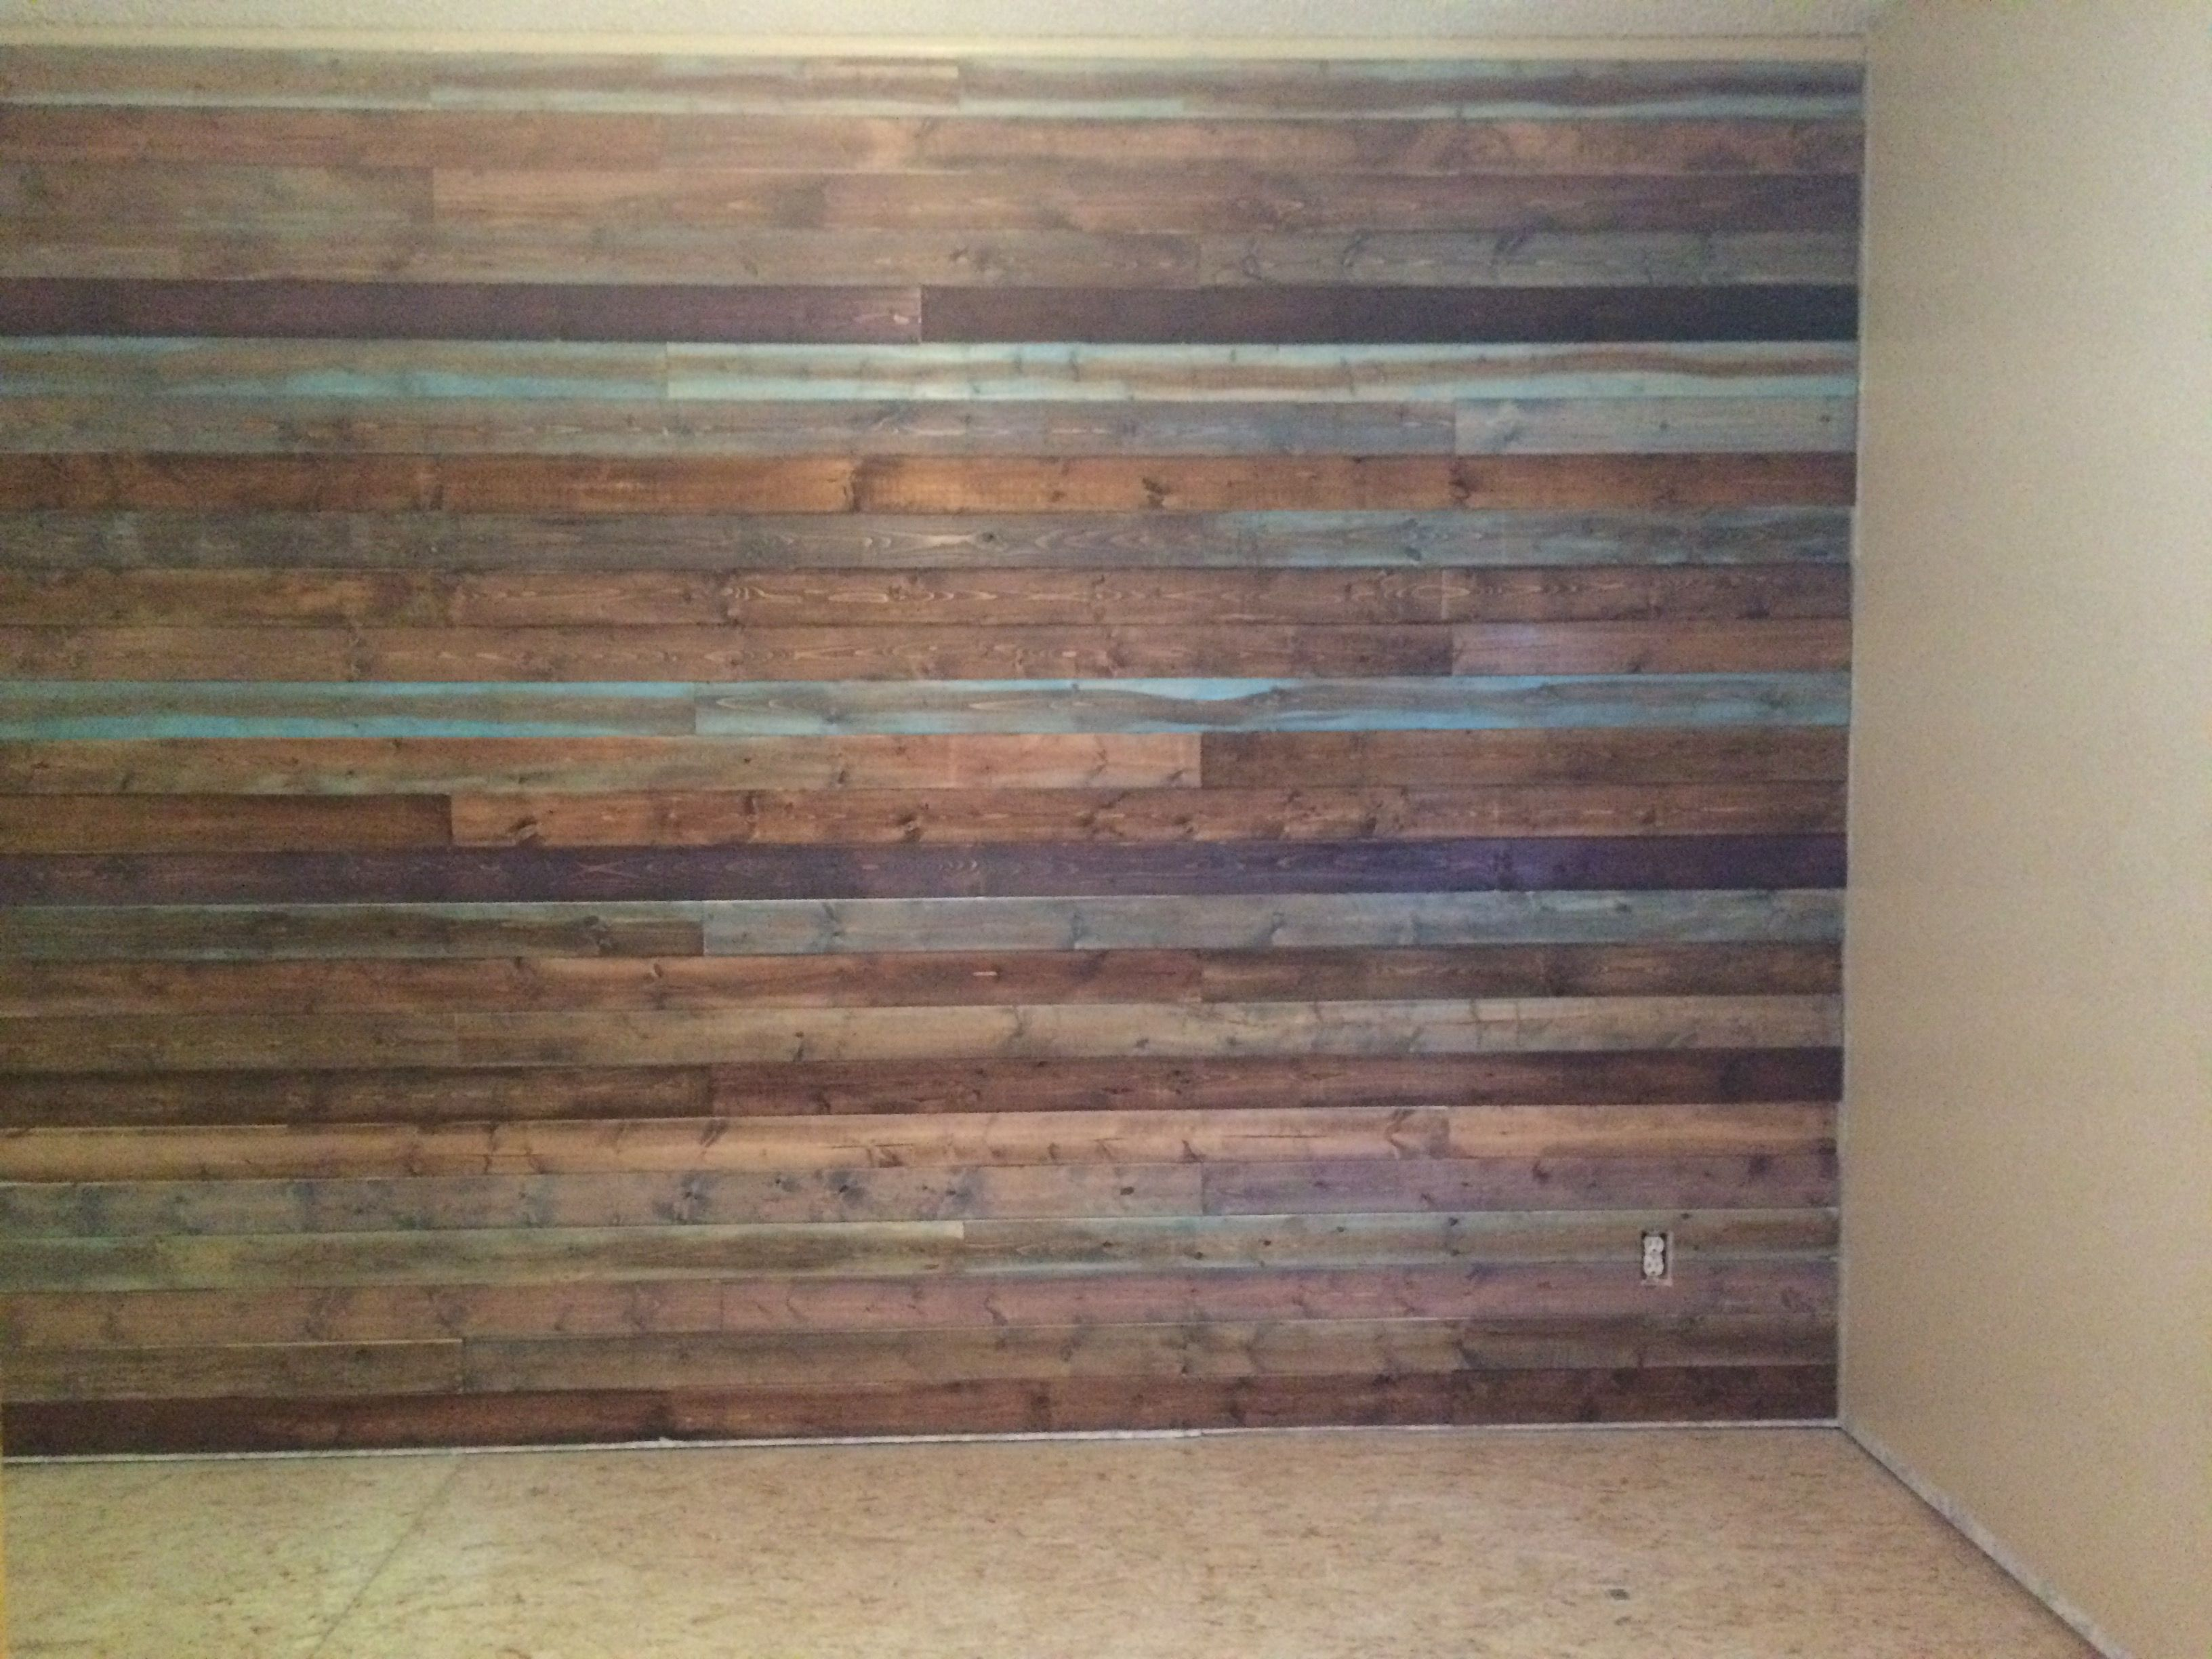 Rustic Pine Wall Tongue And Groove Pine Walls Wood Wall Diy Home Decor